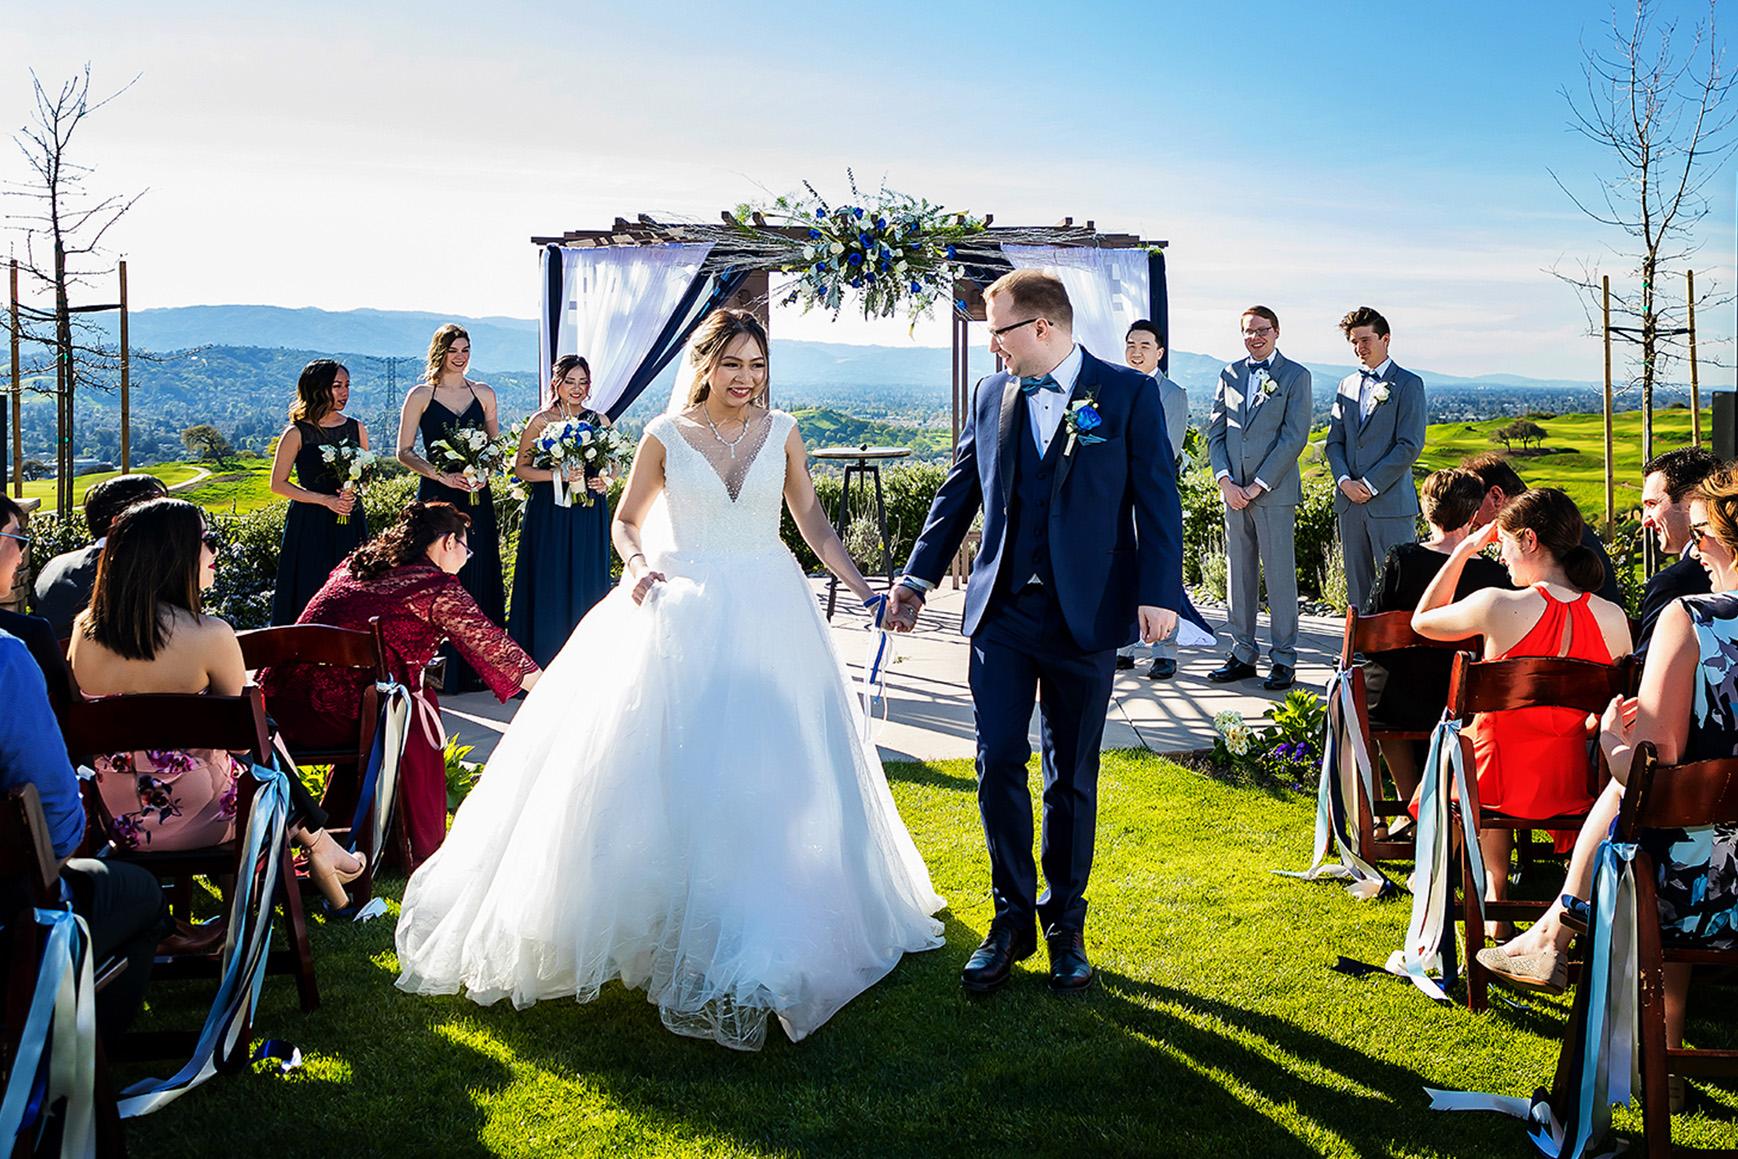 Blue Accented Ceremony - Boulder Ridge - Los Gatos, California - San Jose, California - Santa Clara County - Wedgewood Weddings